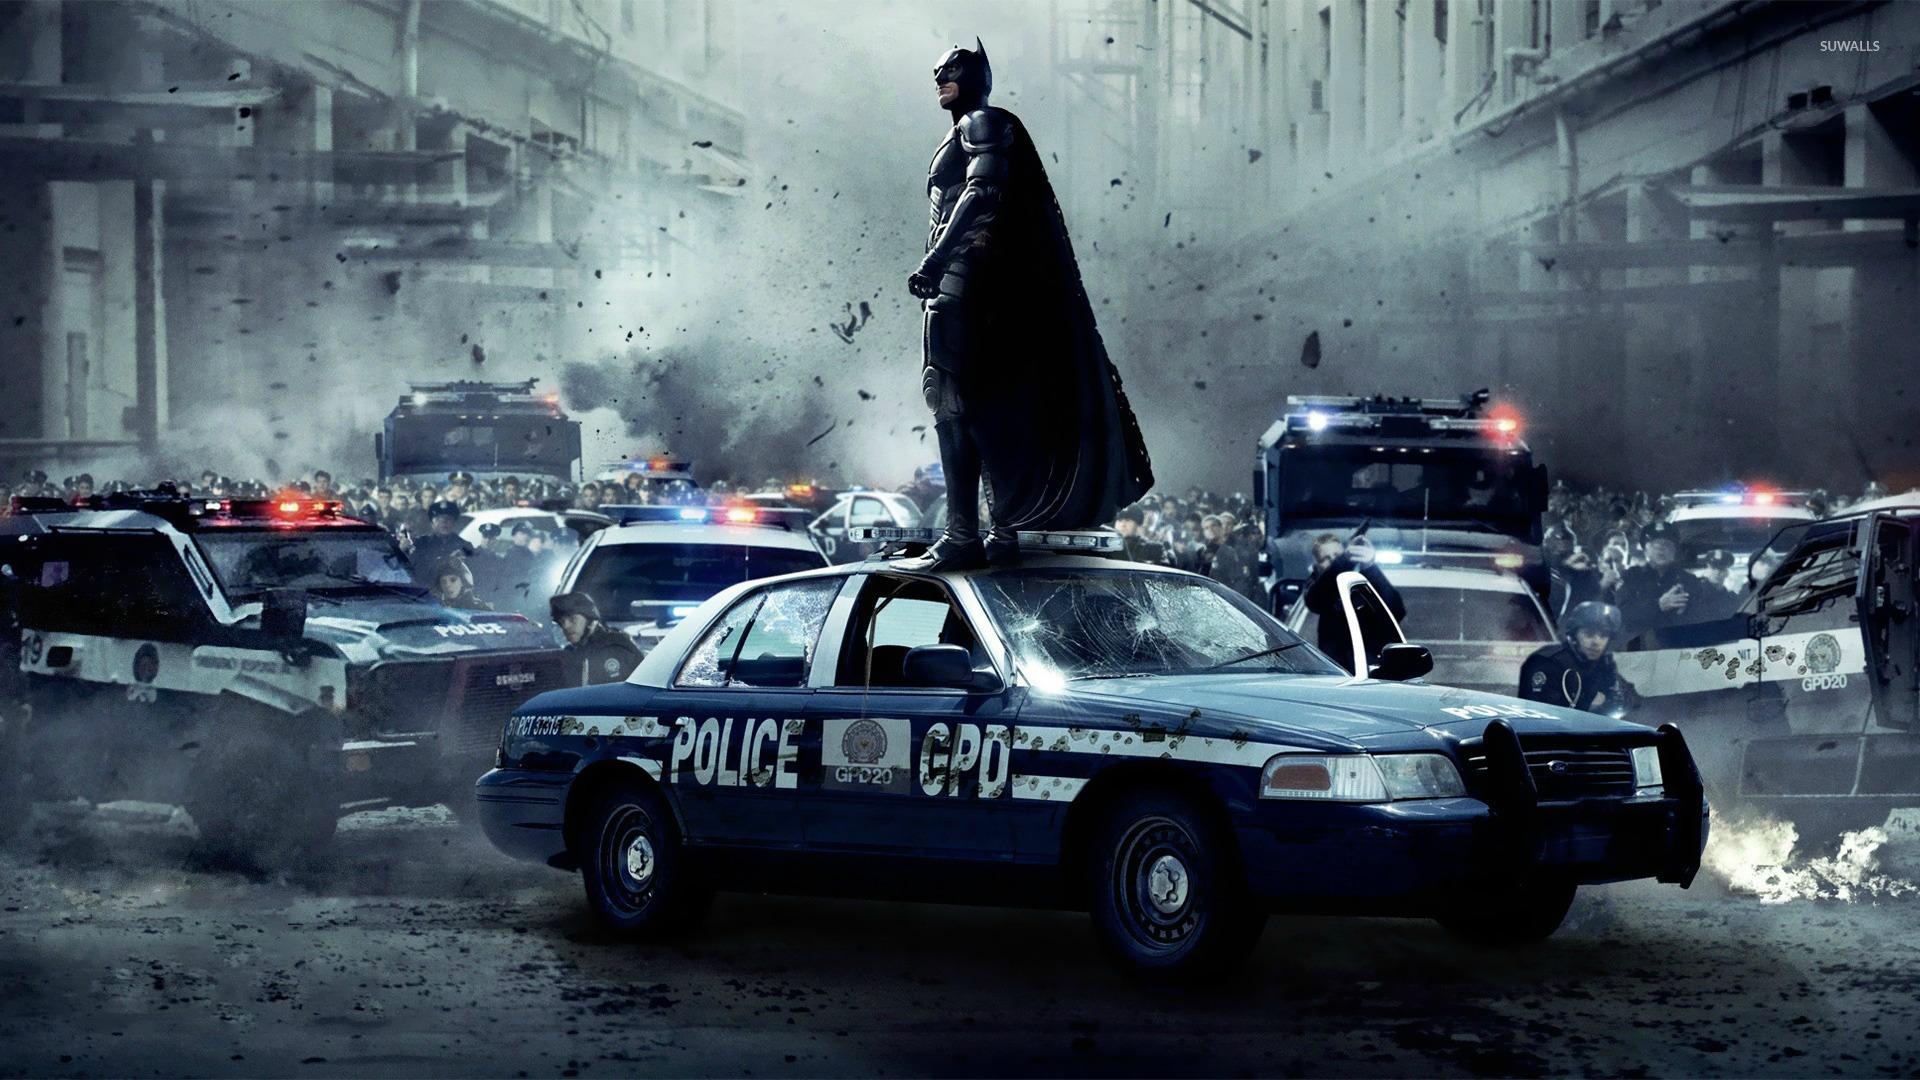 batman - the dark knight rises [5] wallpaper - movie wallpapers - #14540